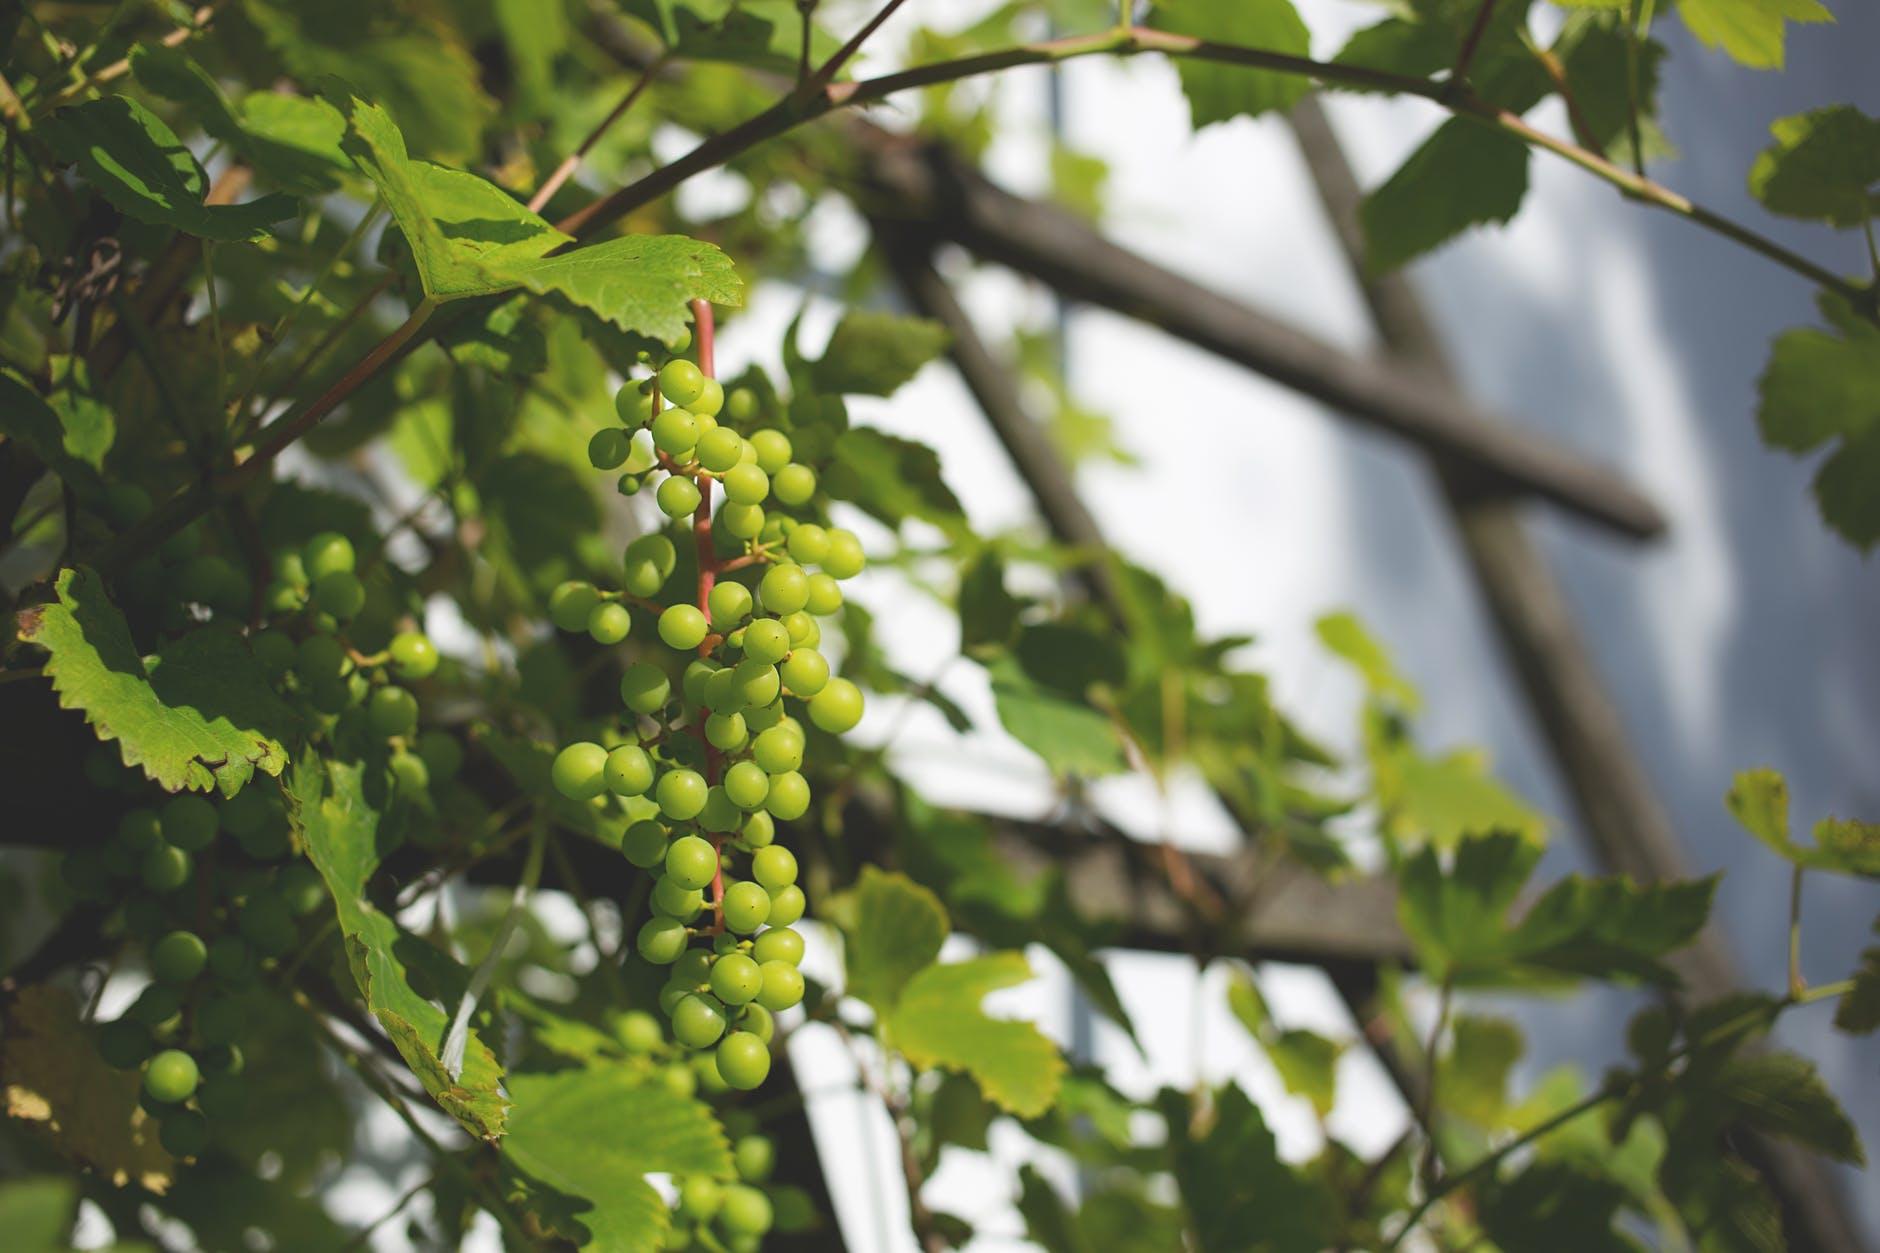 green round fruit